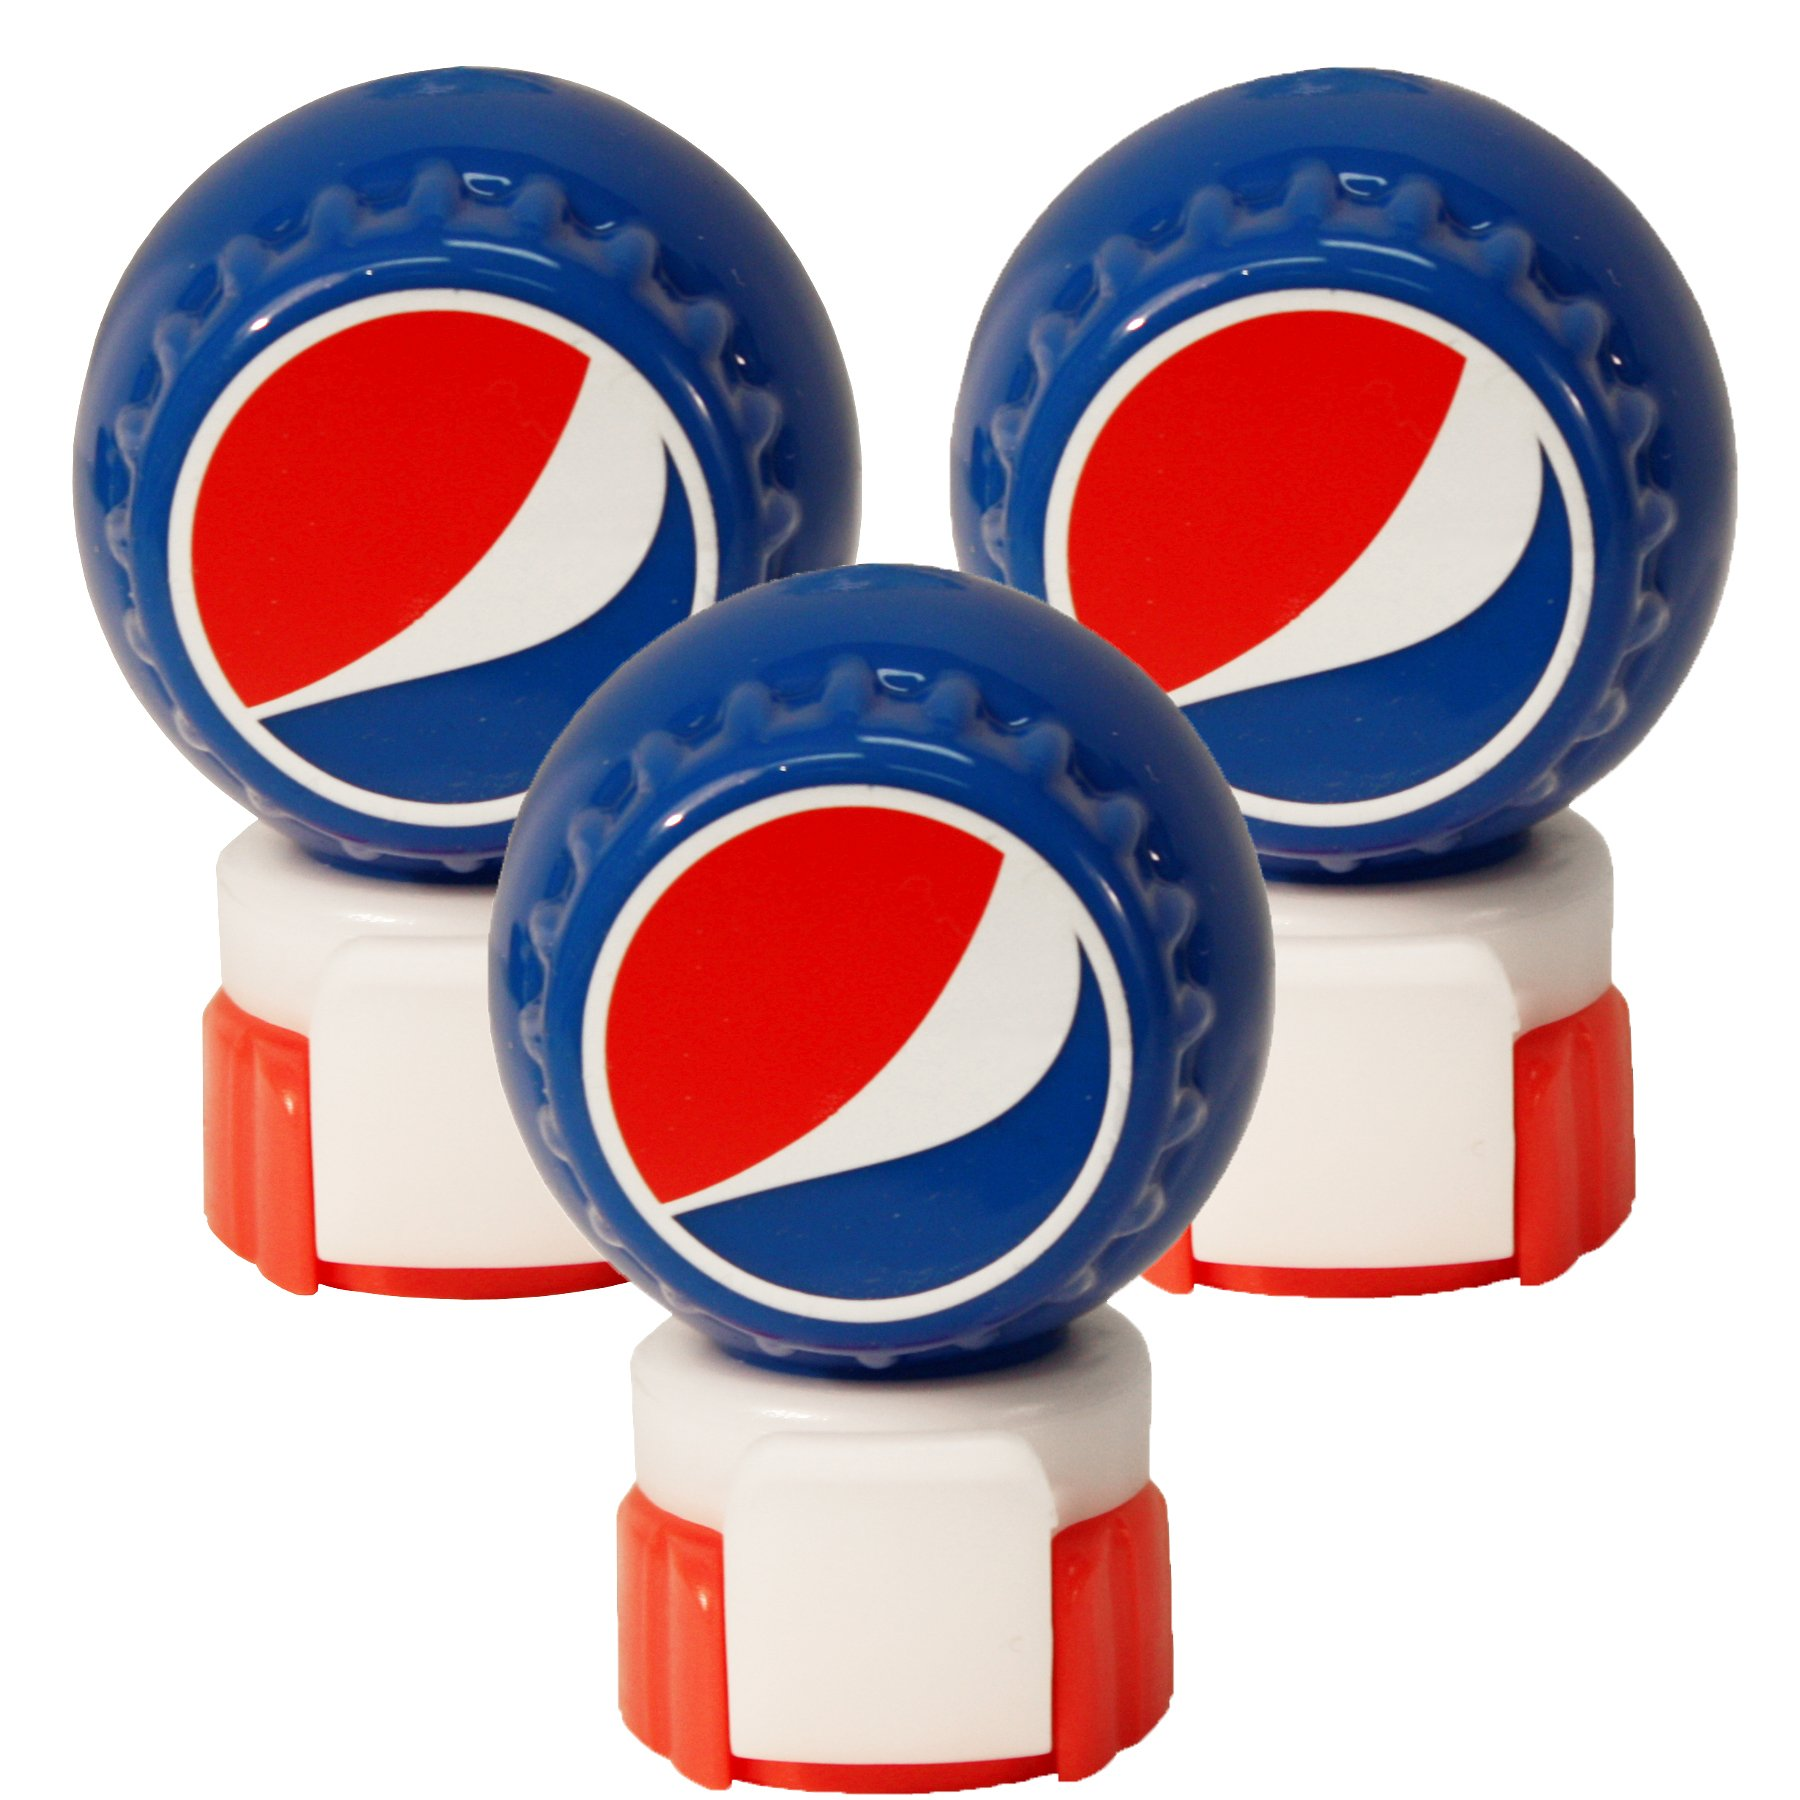 Jokari 3 Count Pepsi Modern Logo Fizz Keeper Soda Bottle Pump and Pour, Red/White/Blue